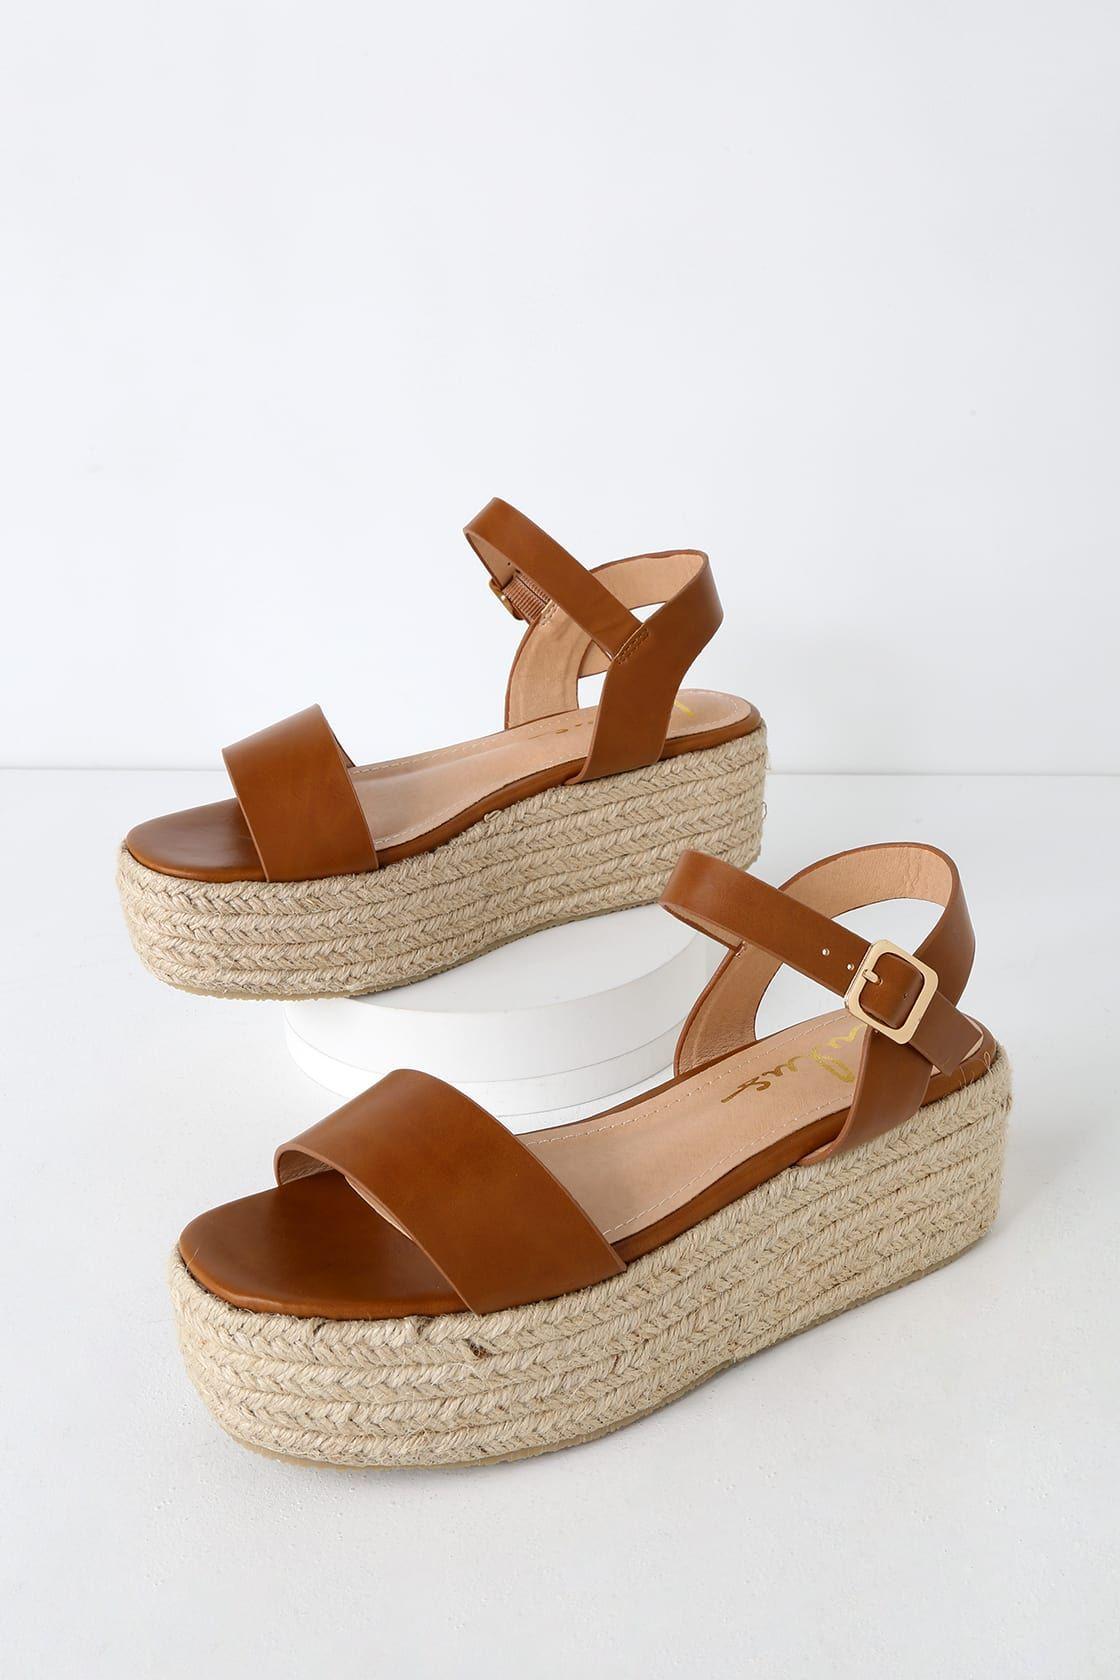 0217483005 Lulus | Corsa Tan Espadrille Flatform Sandals | Size 10 | Vegan ...